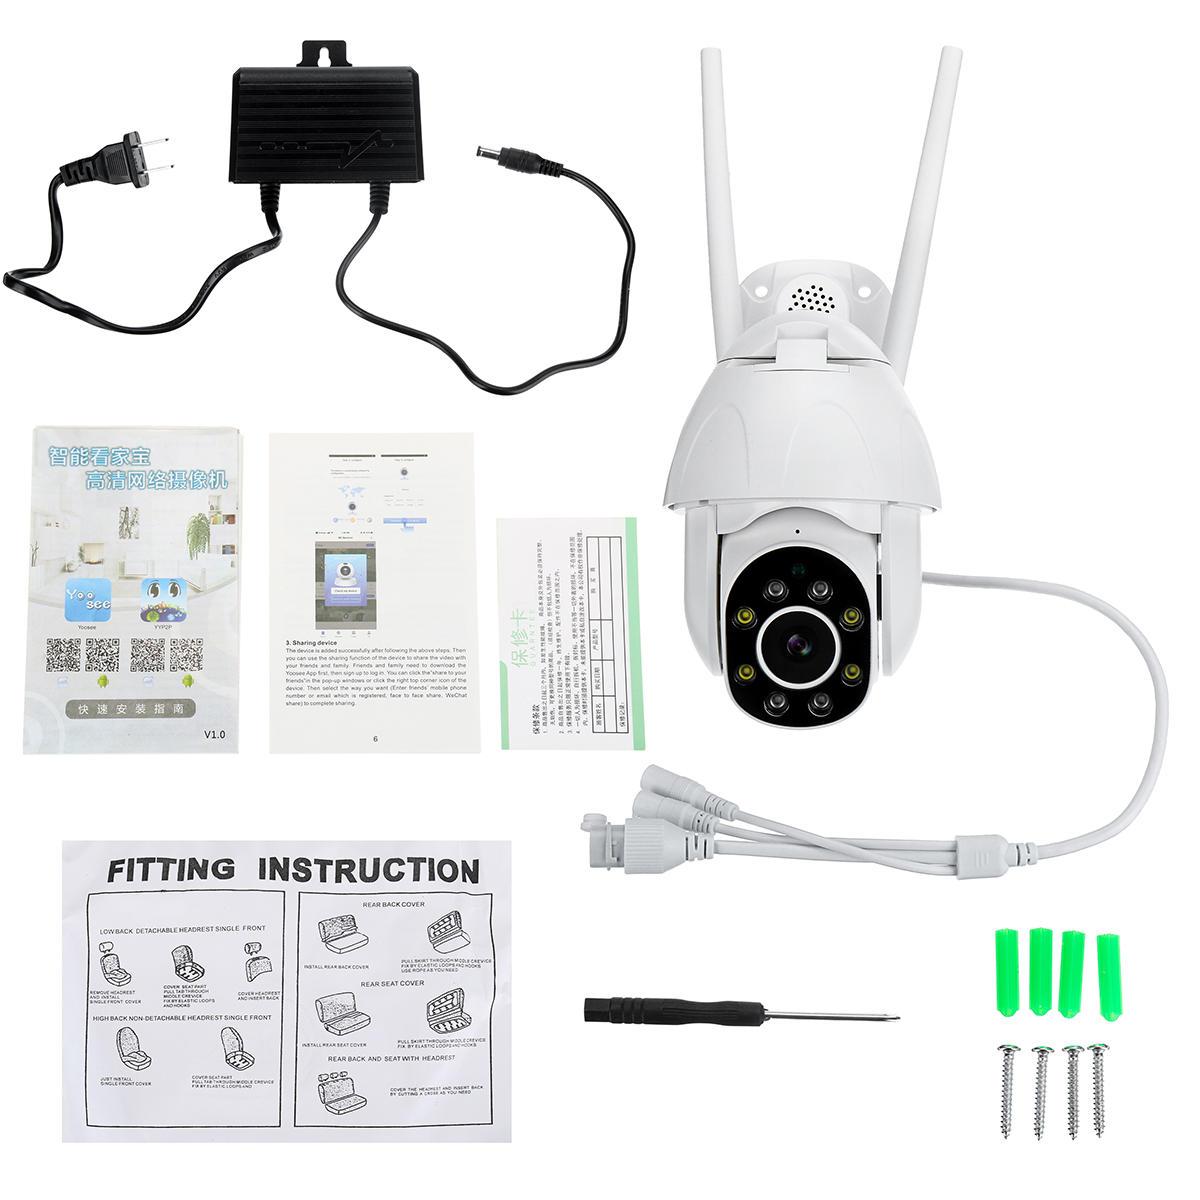 XIAOMI MIJIA 360 Degree 1080P Night Vision IR Camera Motio n Detection Two Way Audio Pan Tilt IP Camera - 6